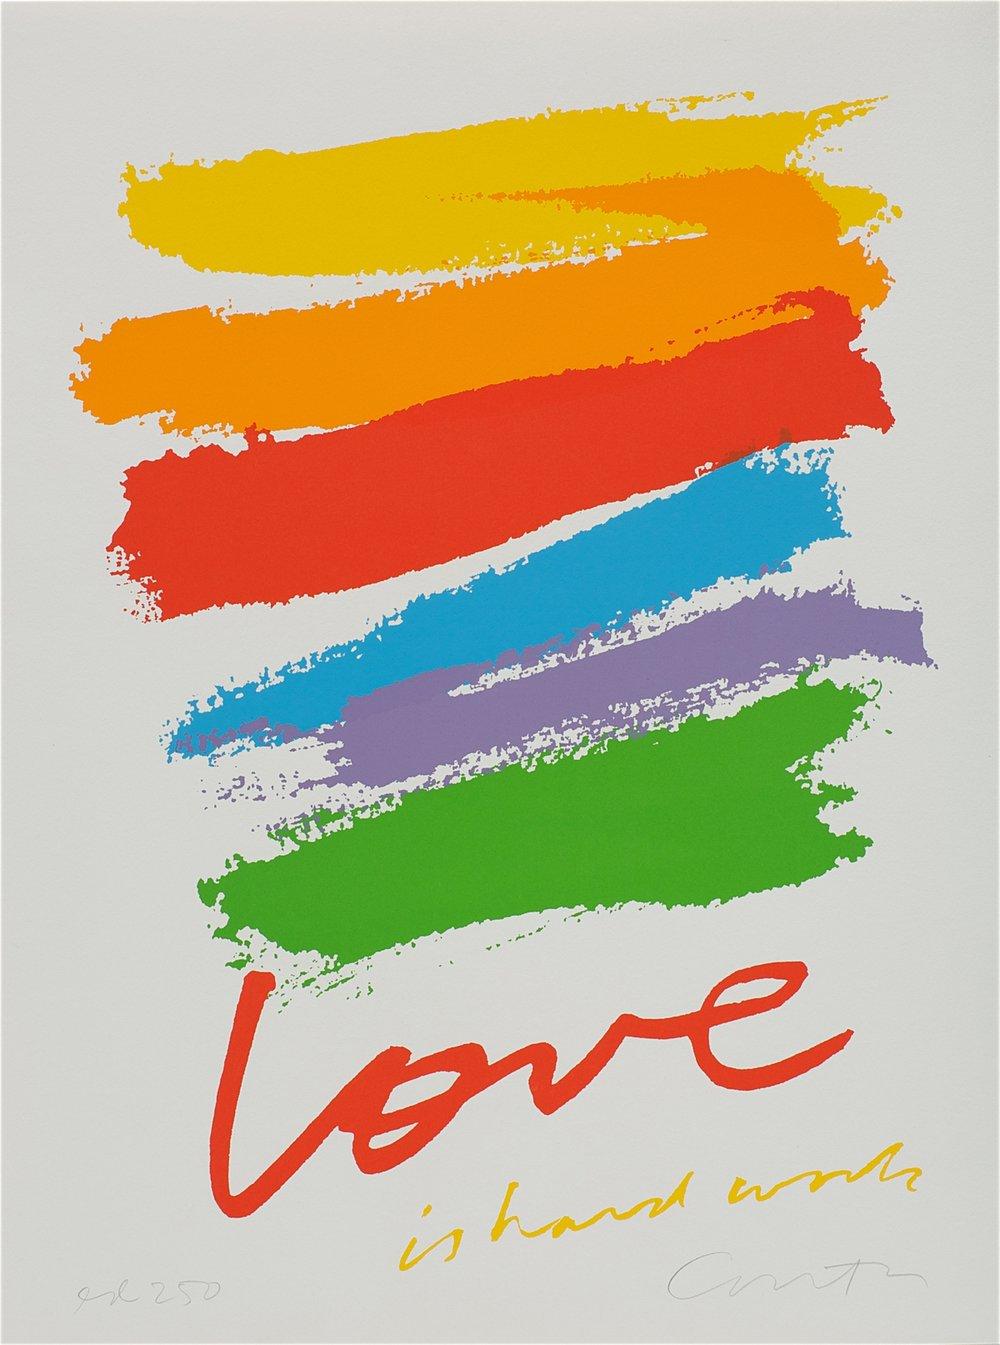 Love is Hard Work+Corita Kent.jpg